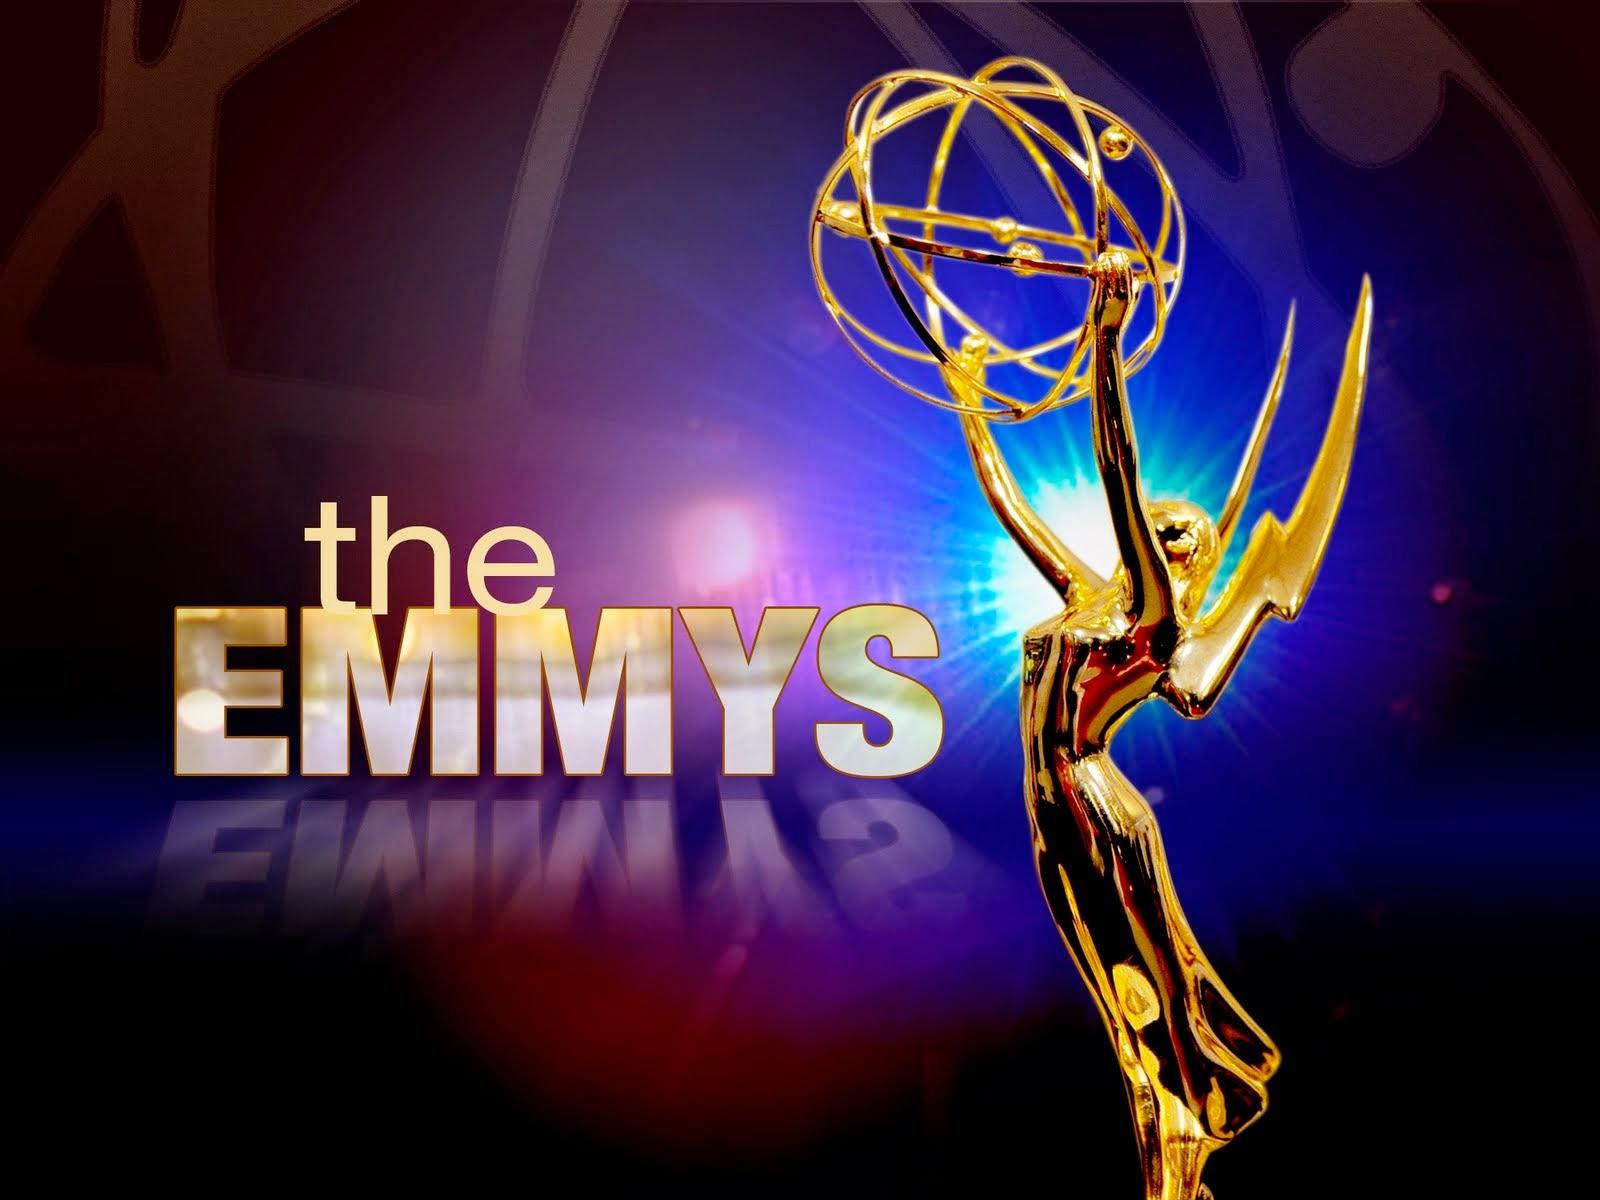 Emmys Awards 2014